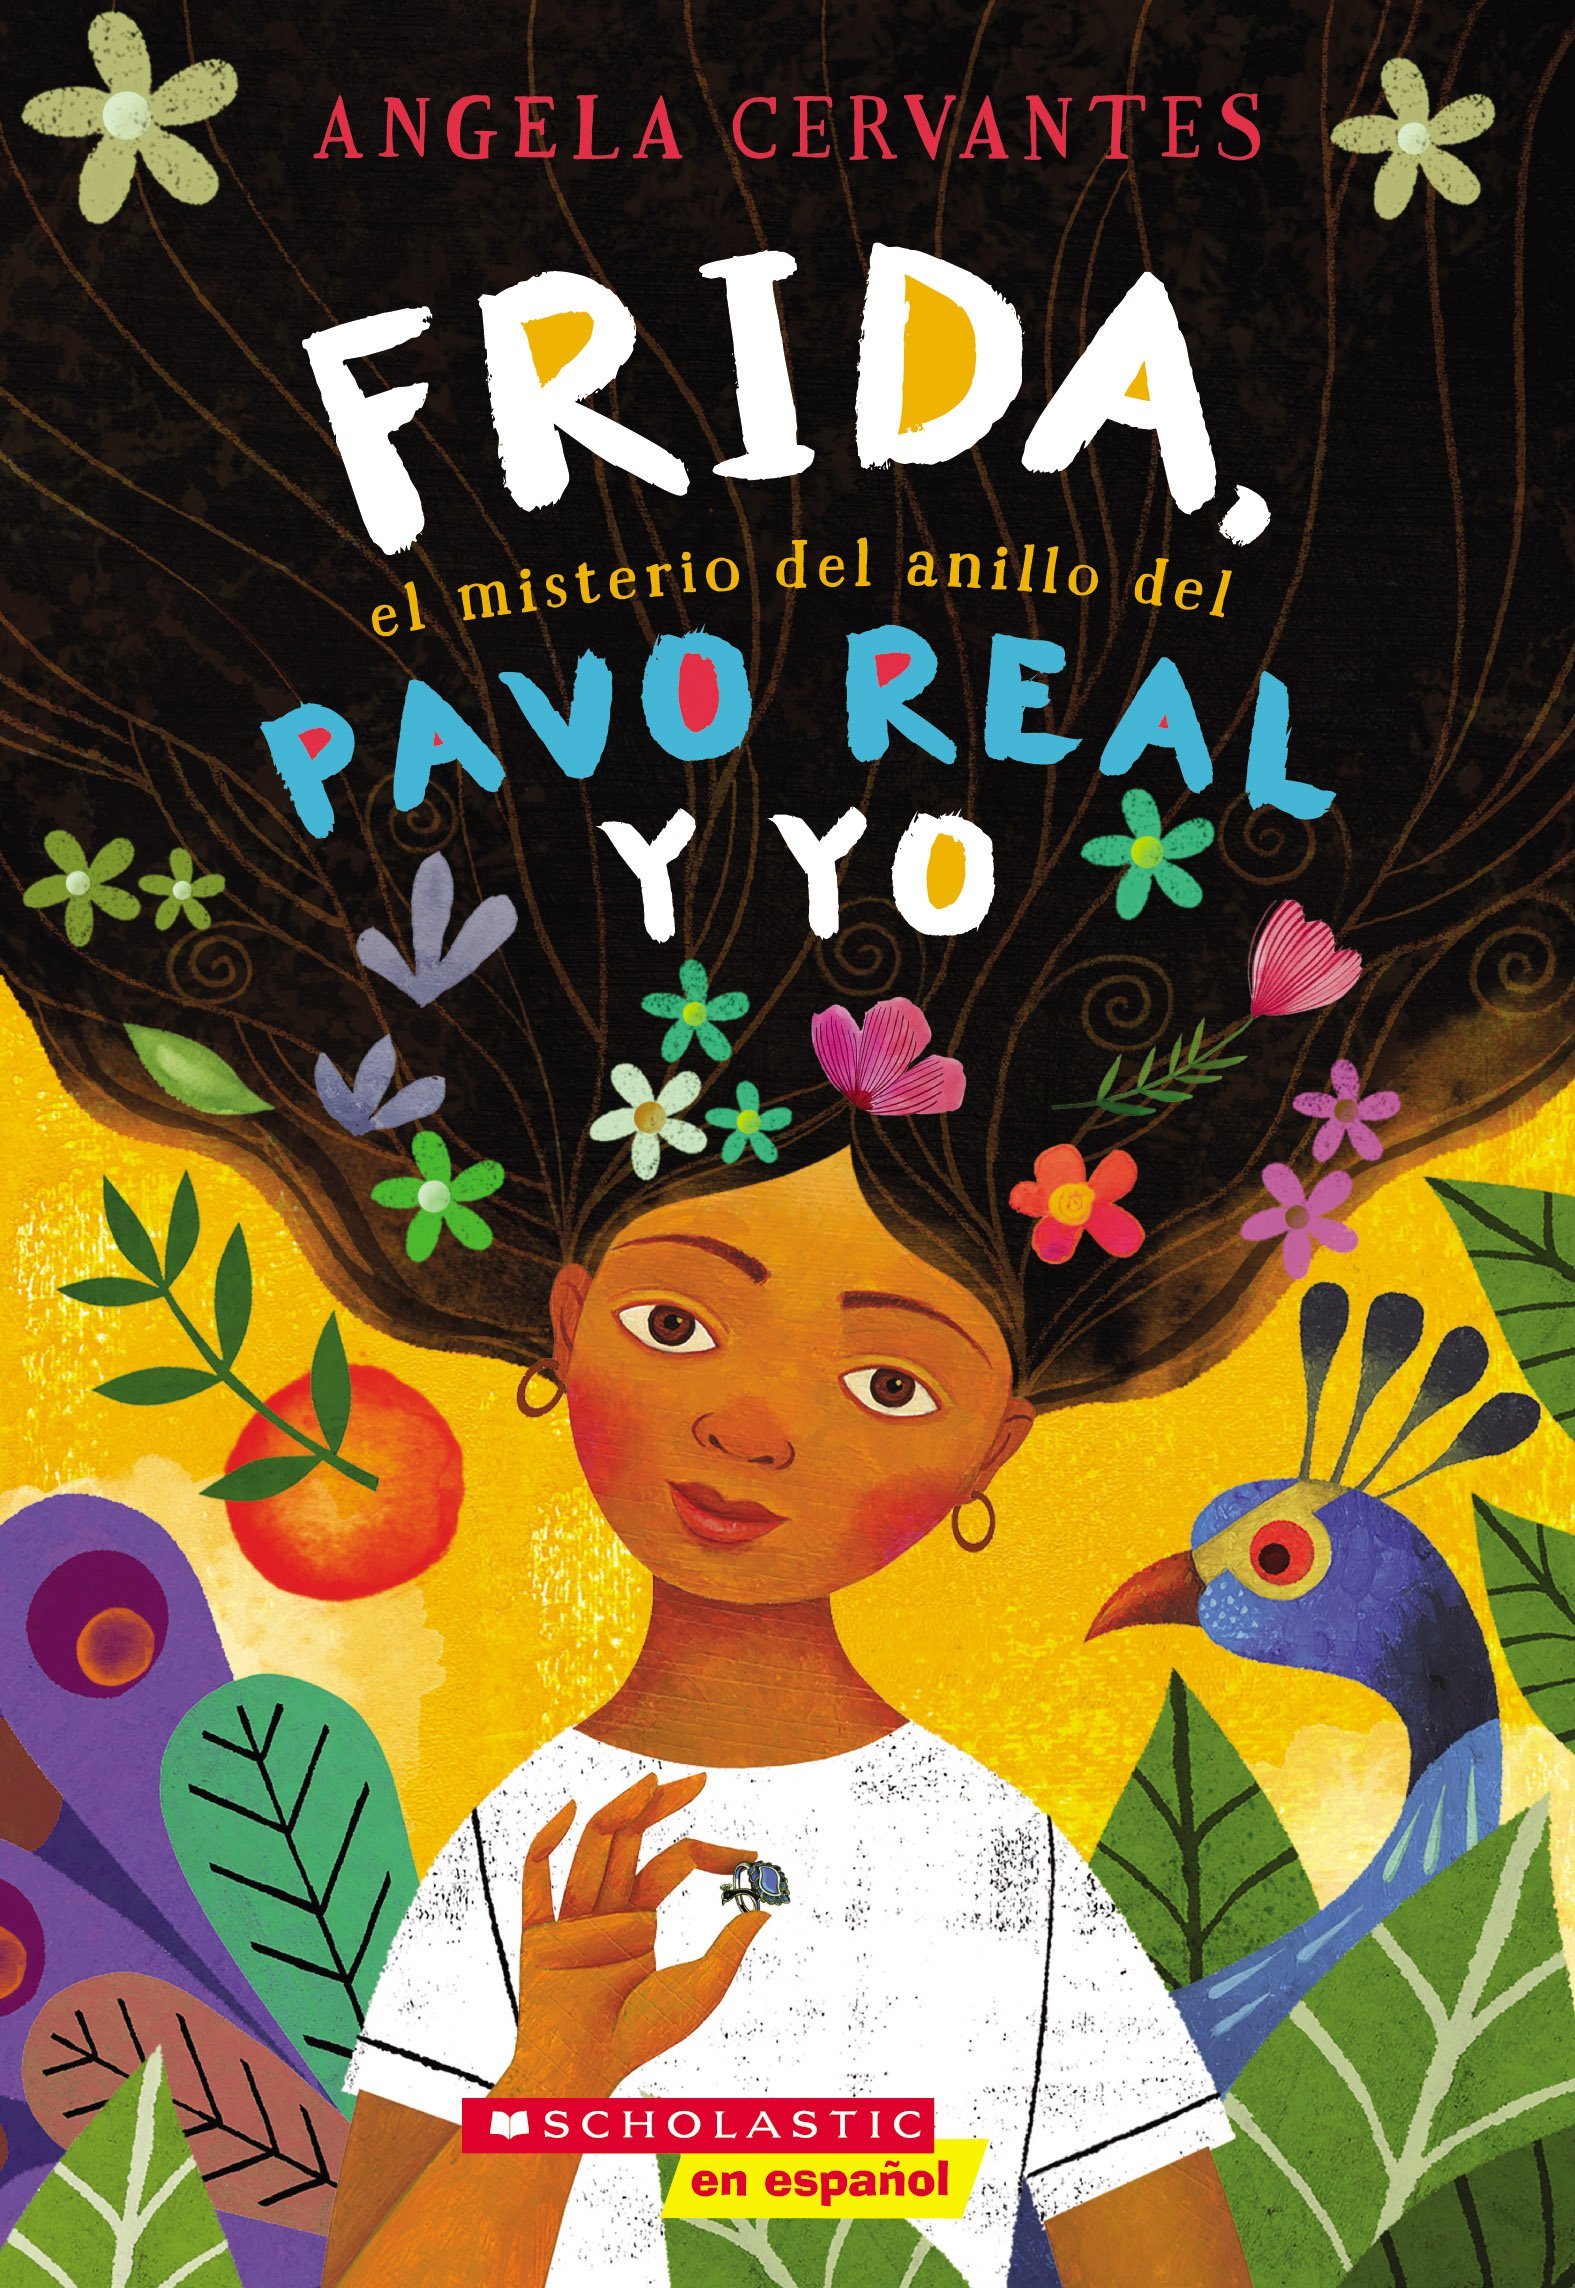 Frida el misterio del anillo del pavo real y yo (Me Frida and the Secret of the Peacock Ring)